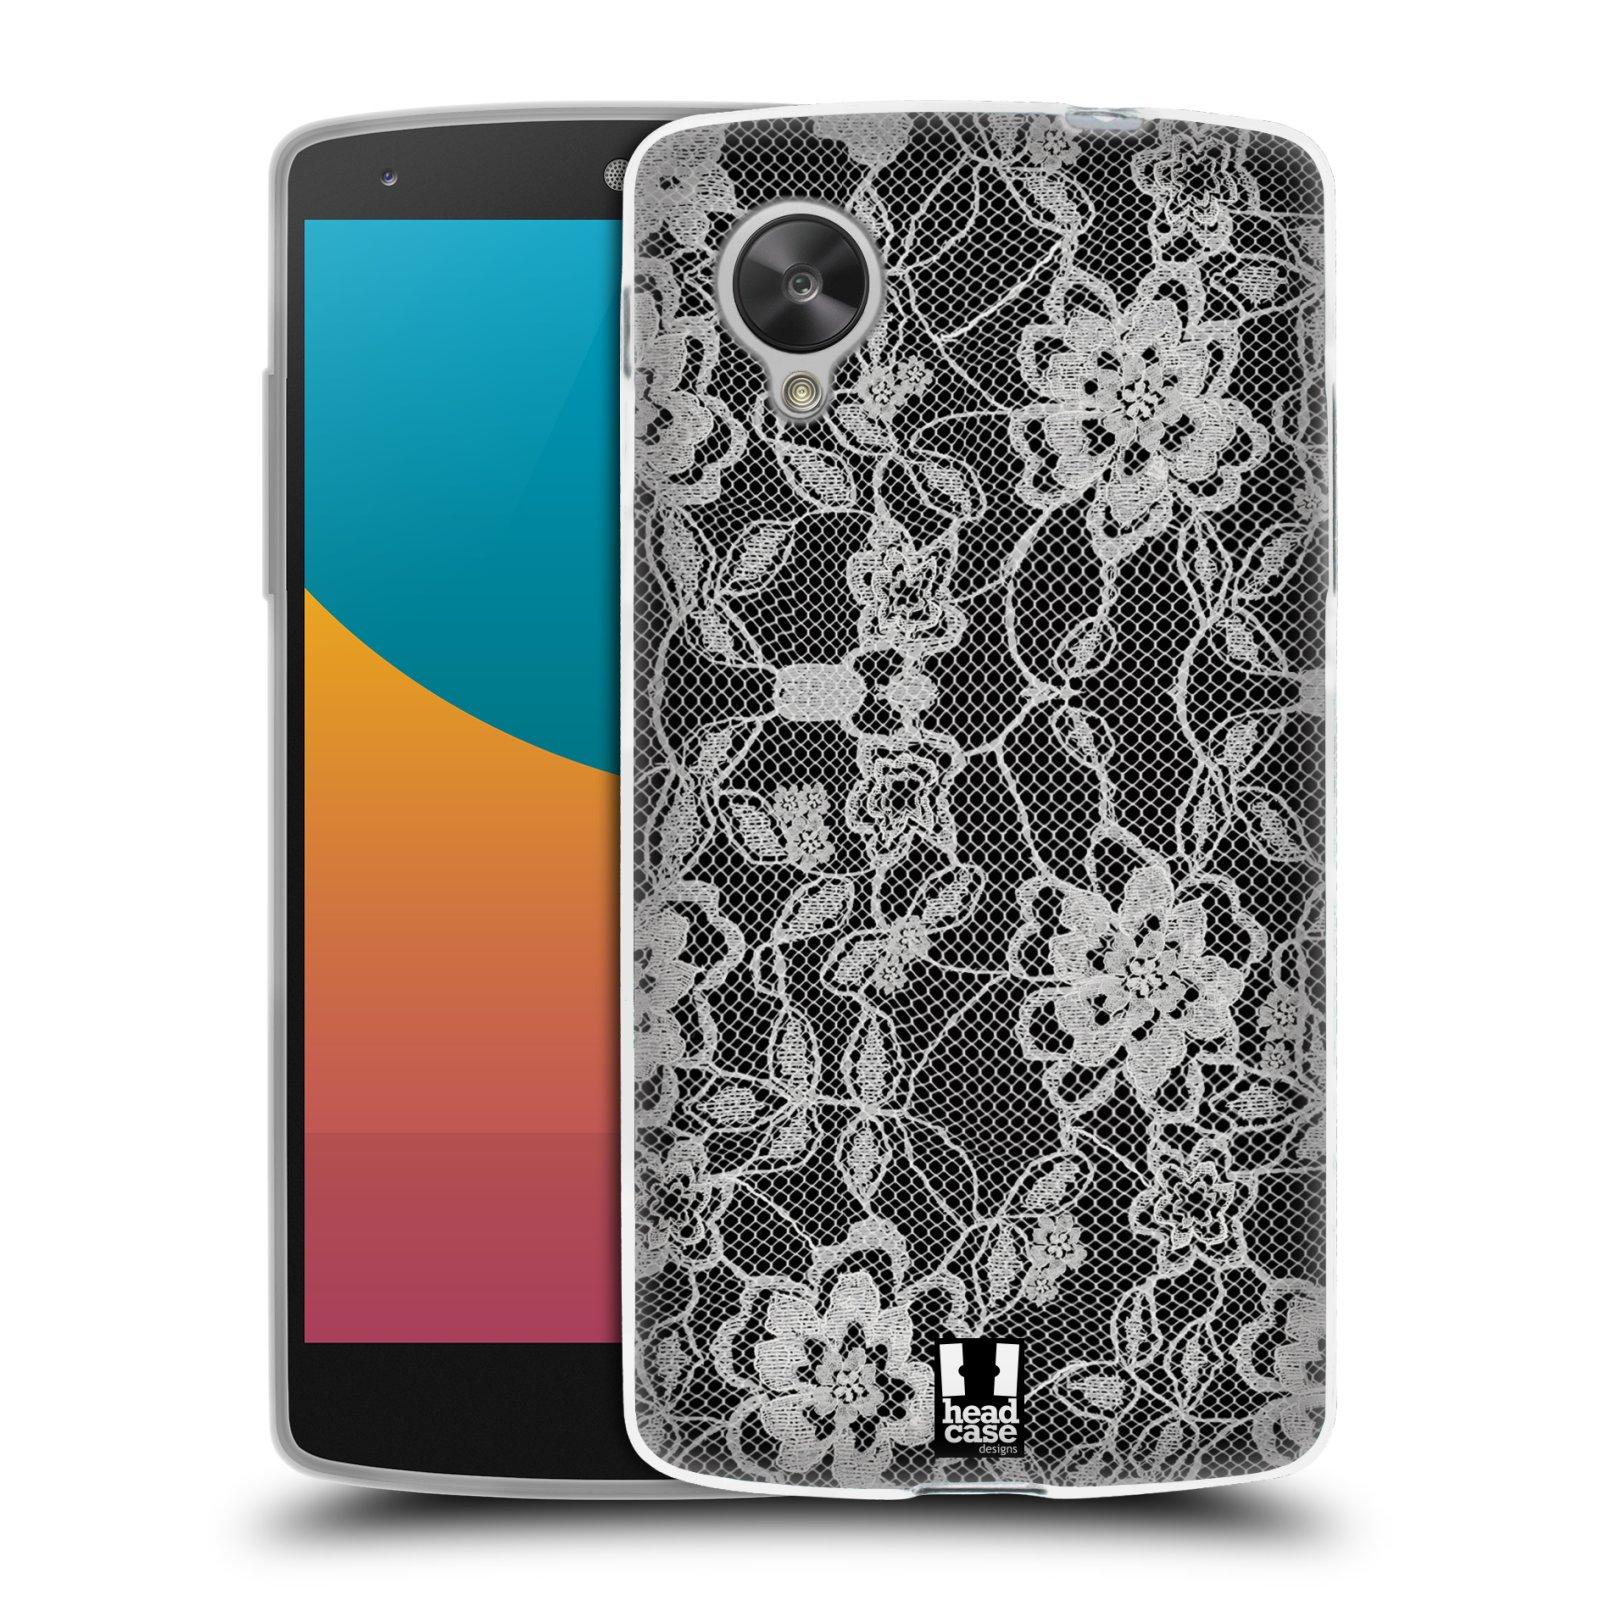 Silikonové pouzdro na mobil LG Nexus 5 HEAD CASE FLOWERY KRAJKA (Silikonový kryt či obal na mobilní telefon LG Google Nexus 5 D821)